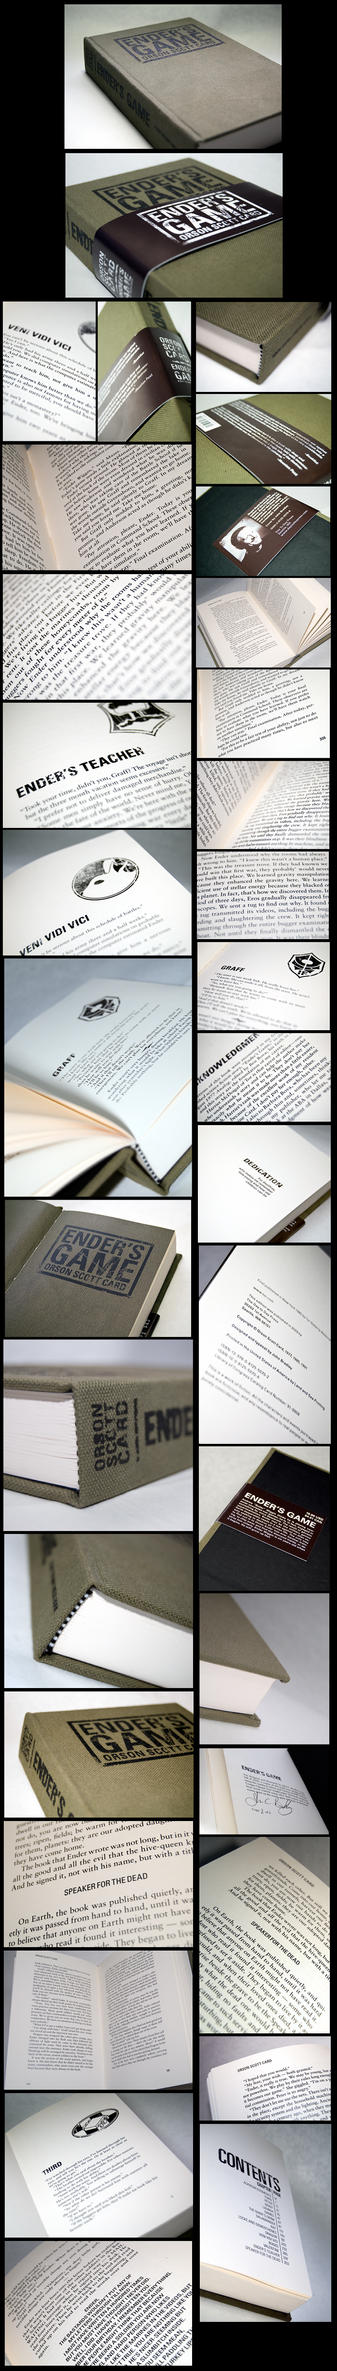 Ender's Game Book by jcbradley